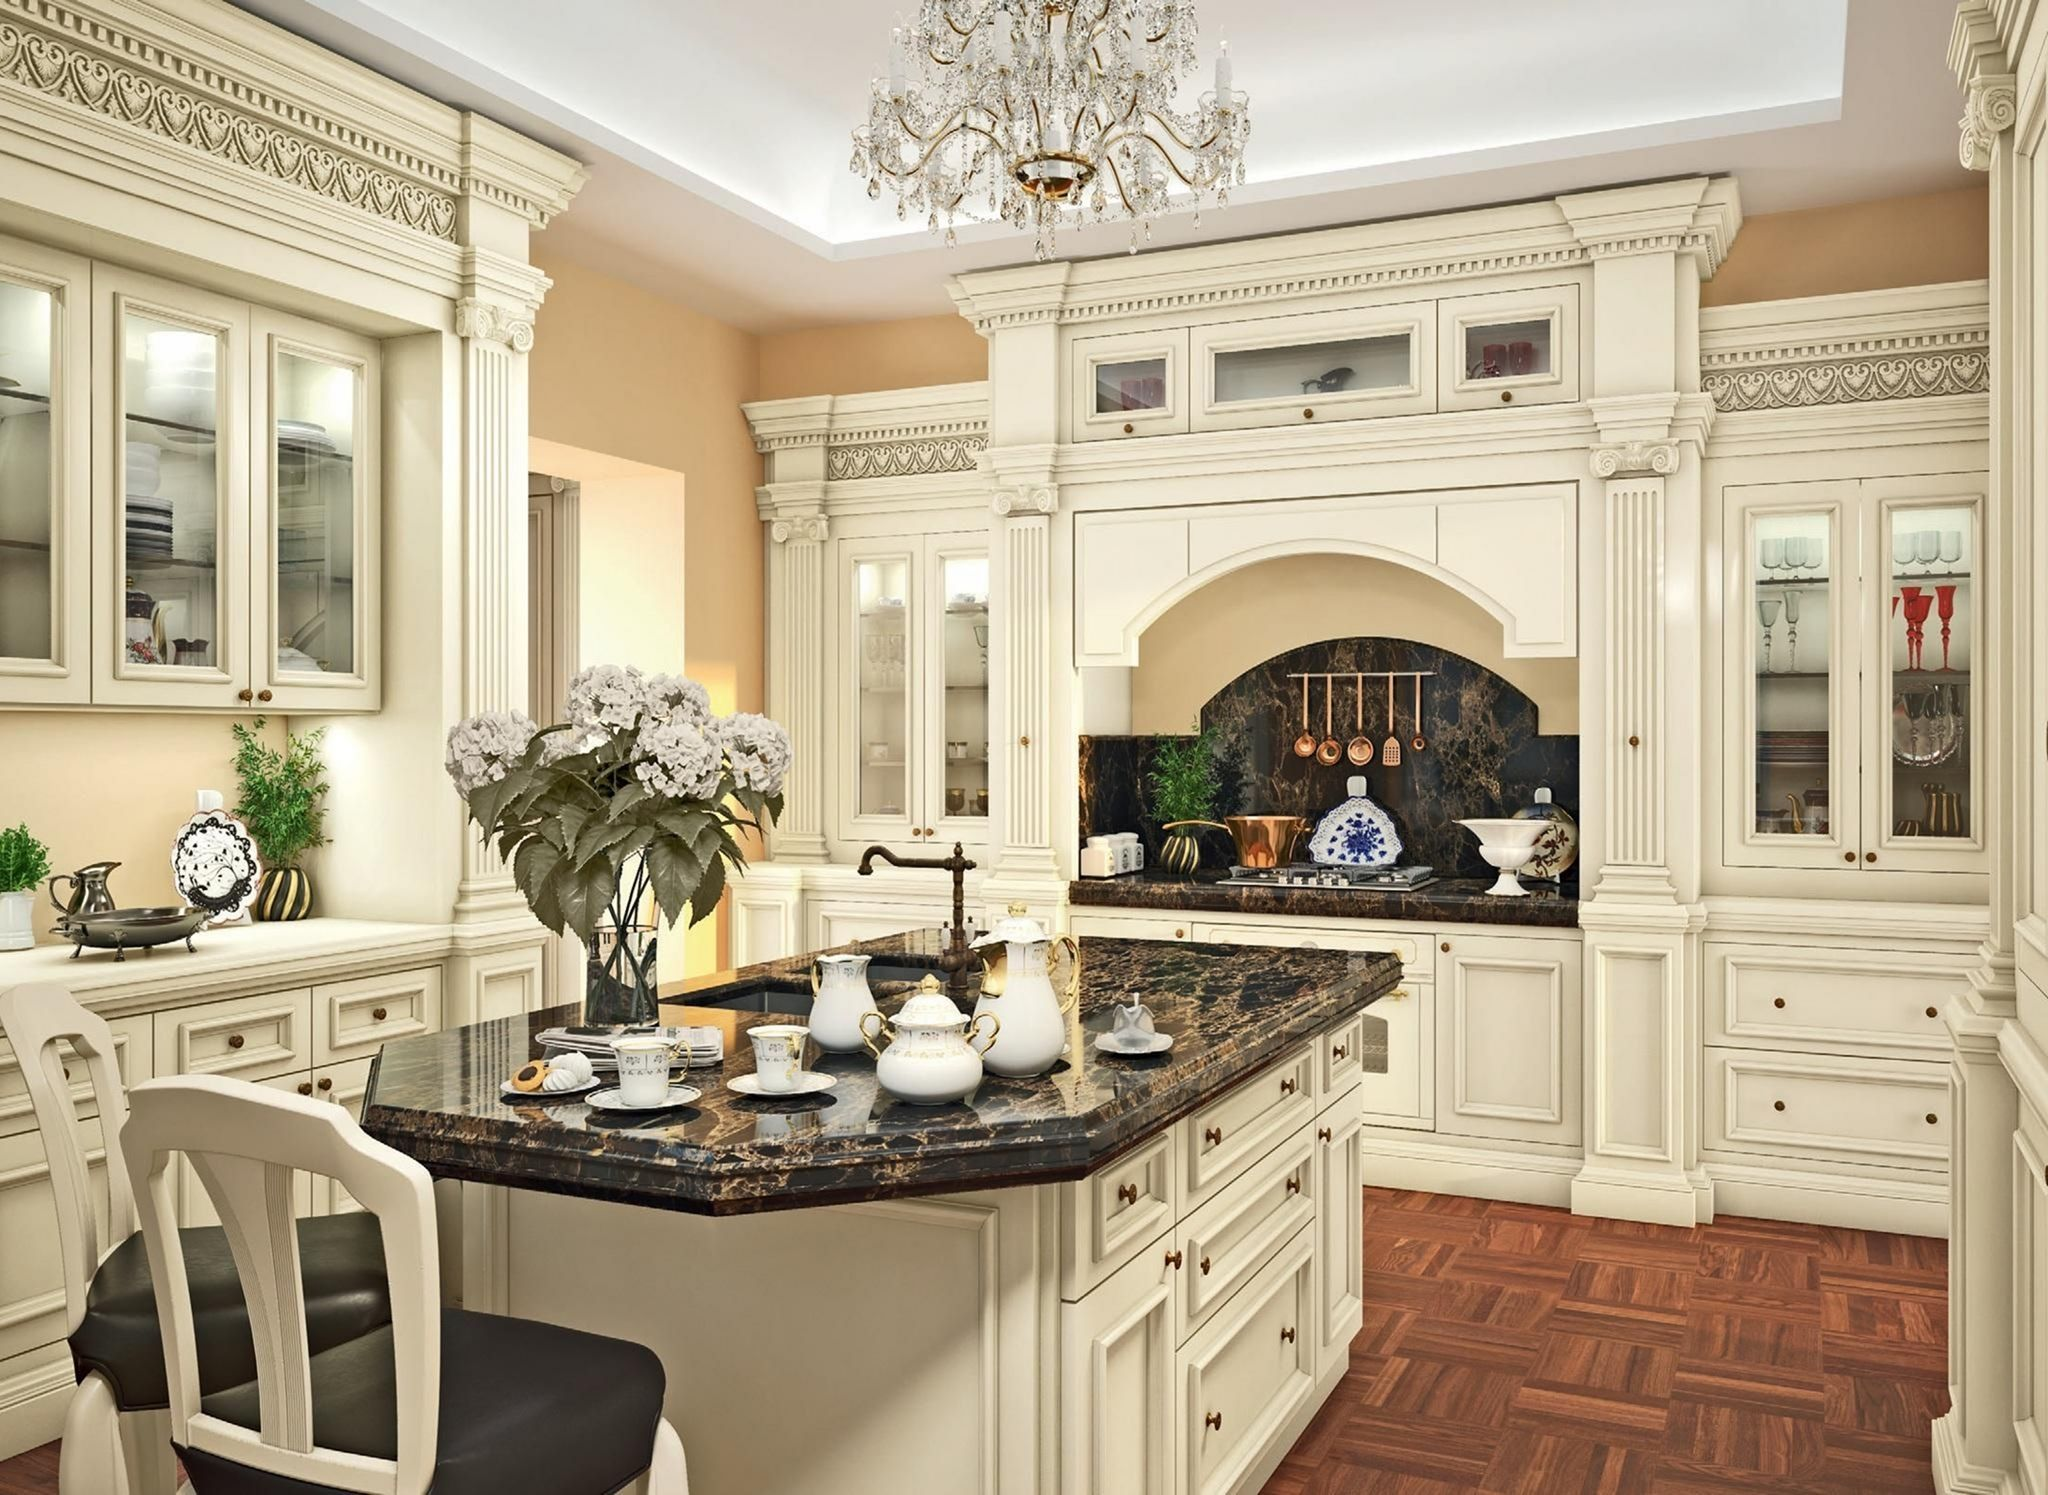 30 classic luxurious kitchen design ideas that you must know classic kitchen design classic on kitchen interior classic id=63368